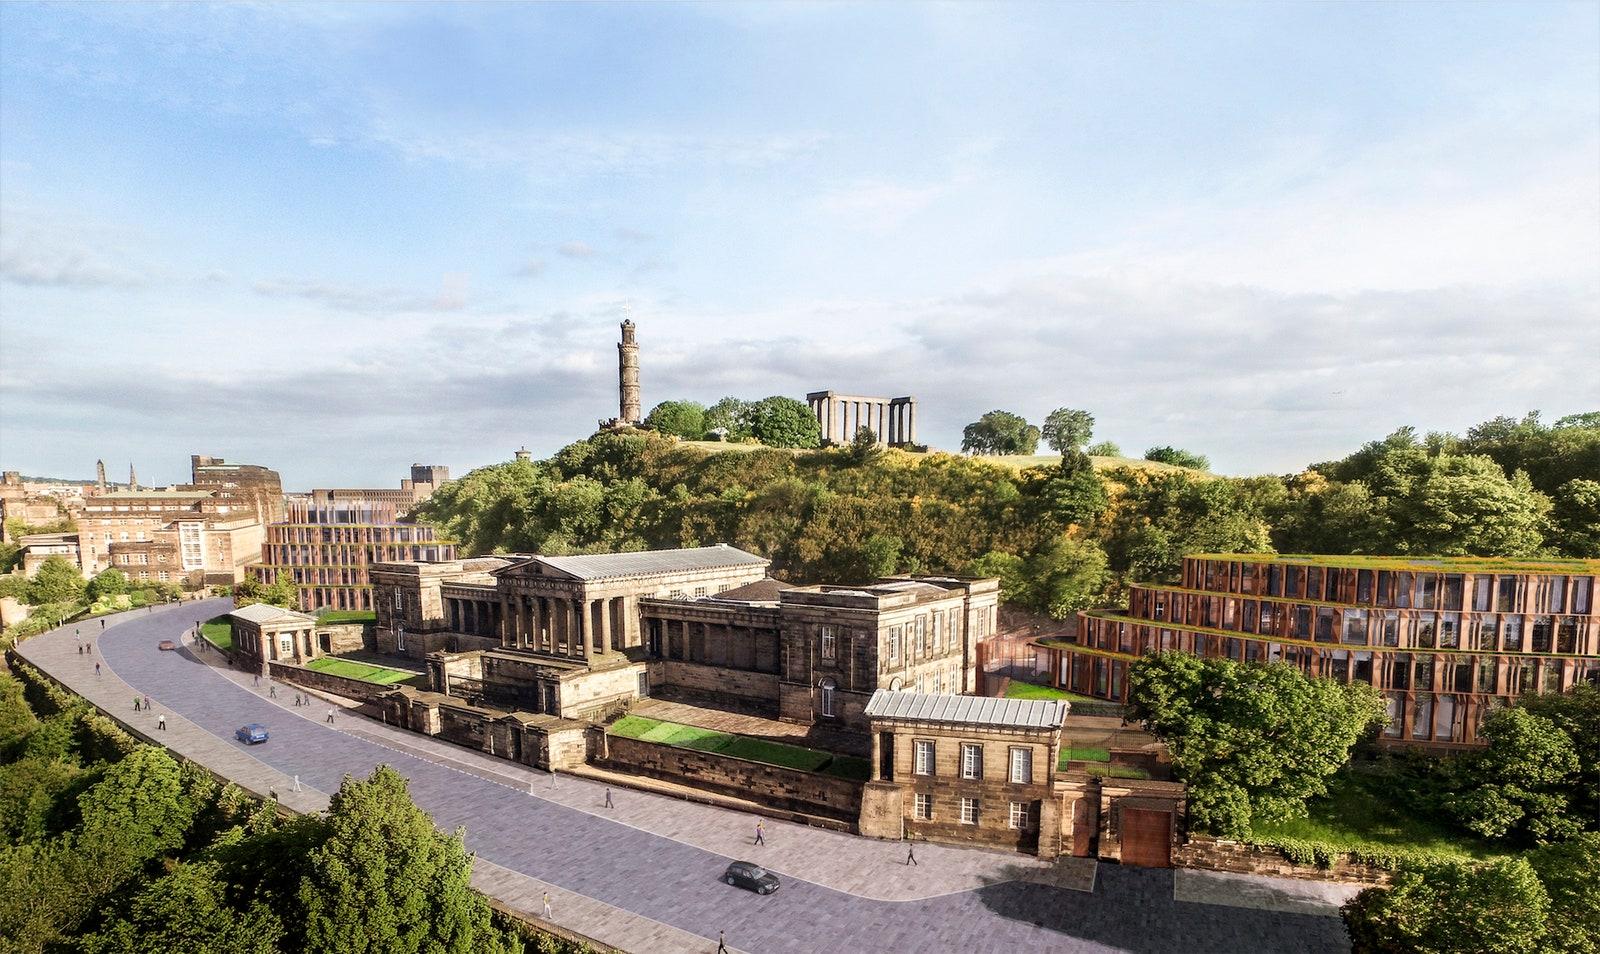 Rosewood Hotel Edinburgh